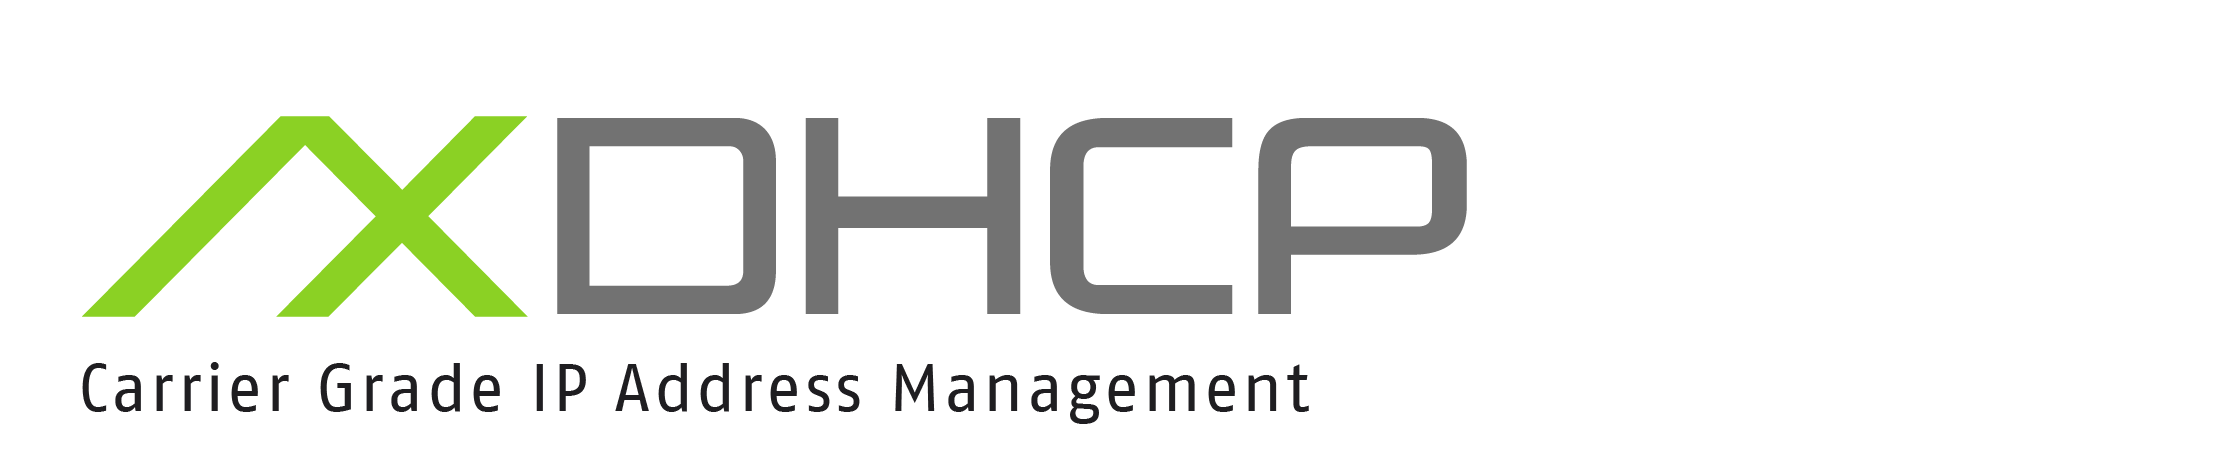 axdhcp_logo.png